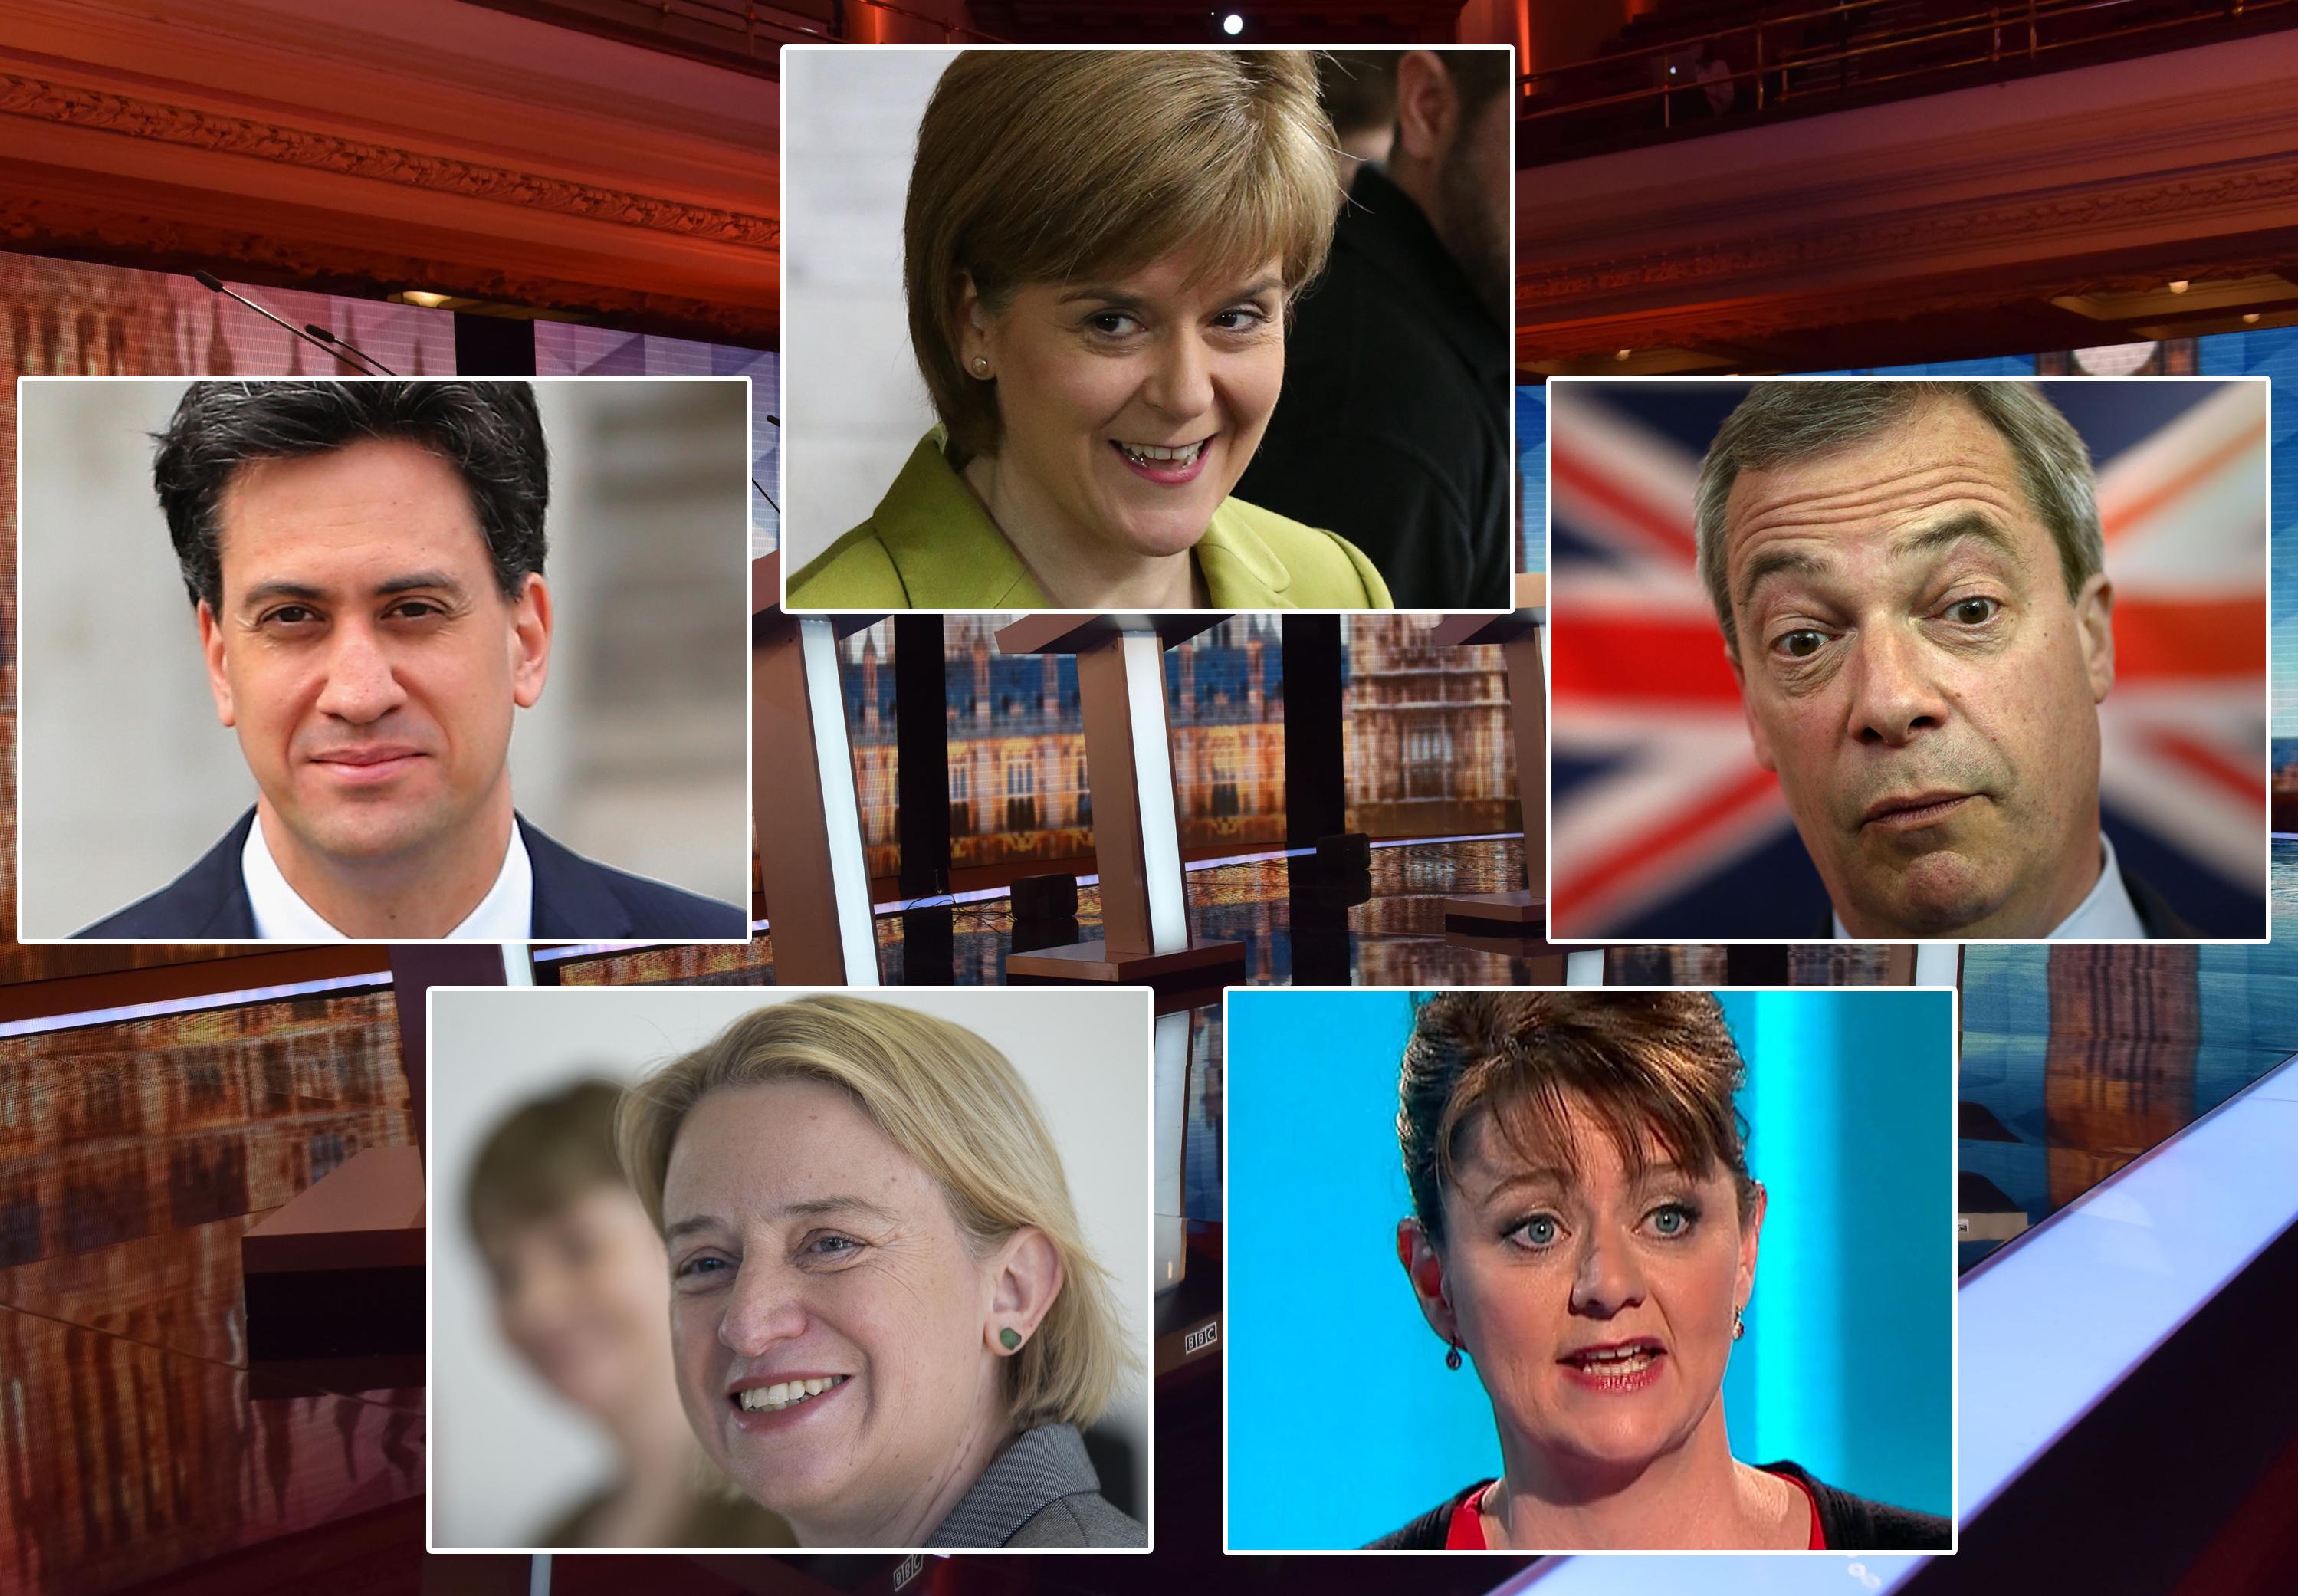 BBC Election Debate between Ed Miiband, Nigel Farage, Natalie Bennett, Nicola Sturgeon and Leanne Wood